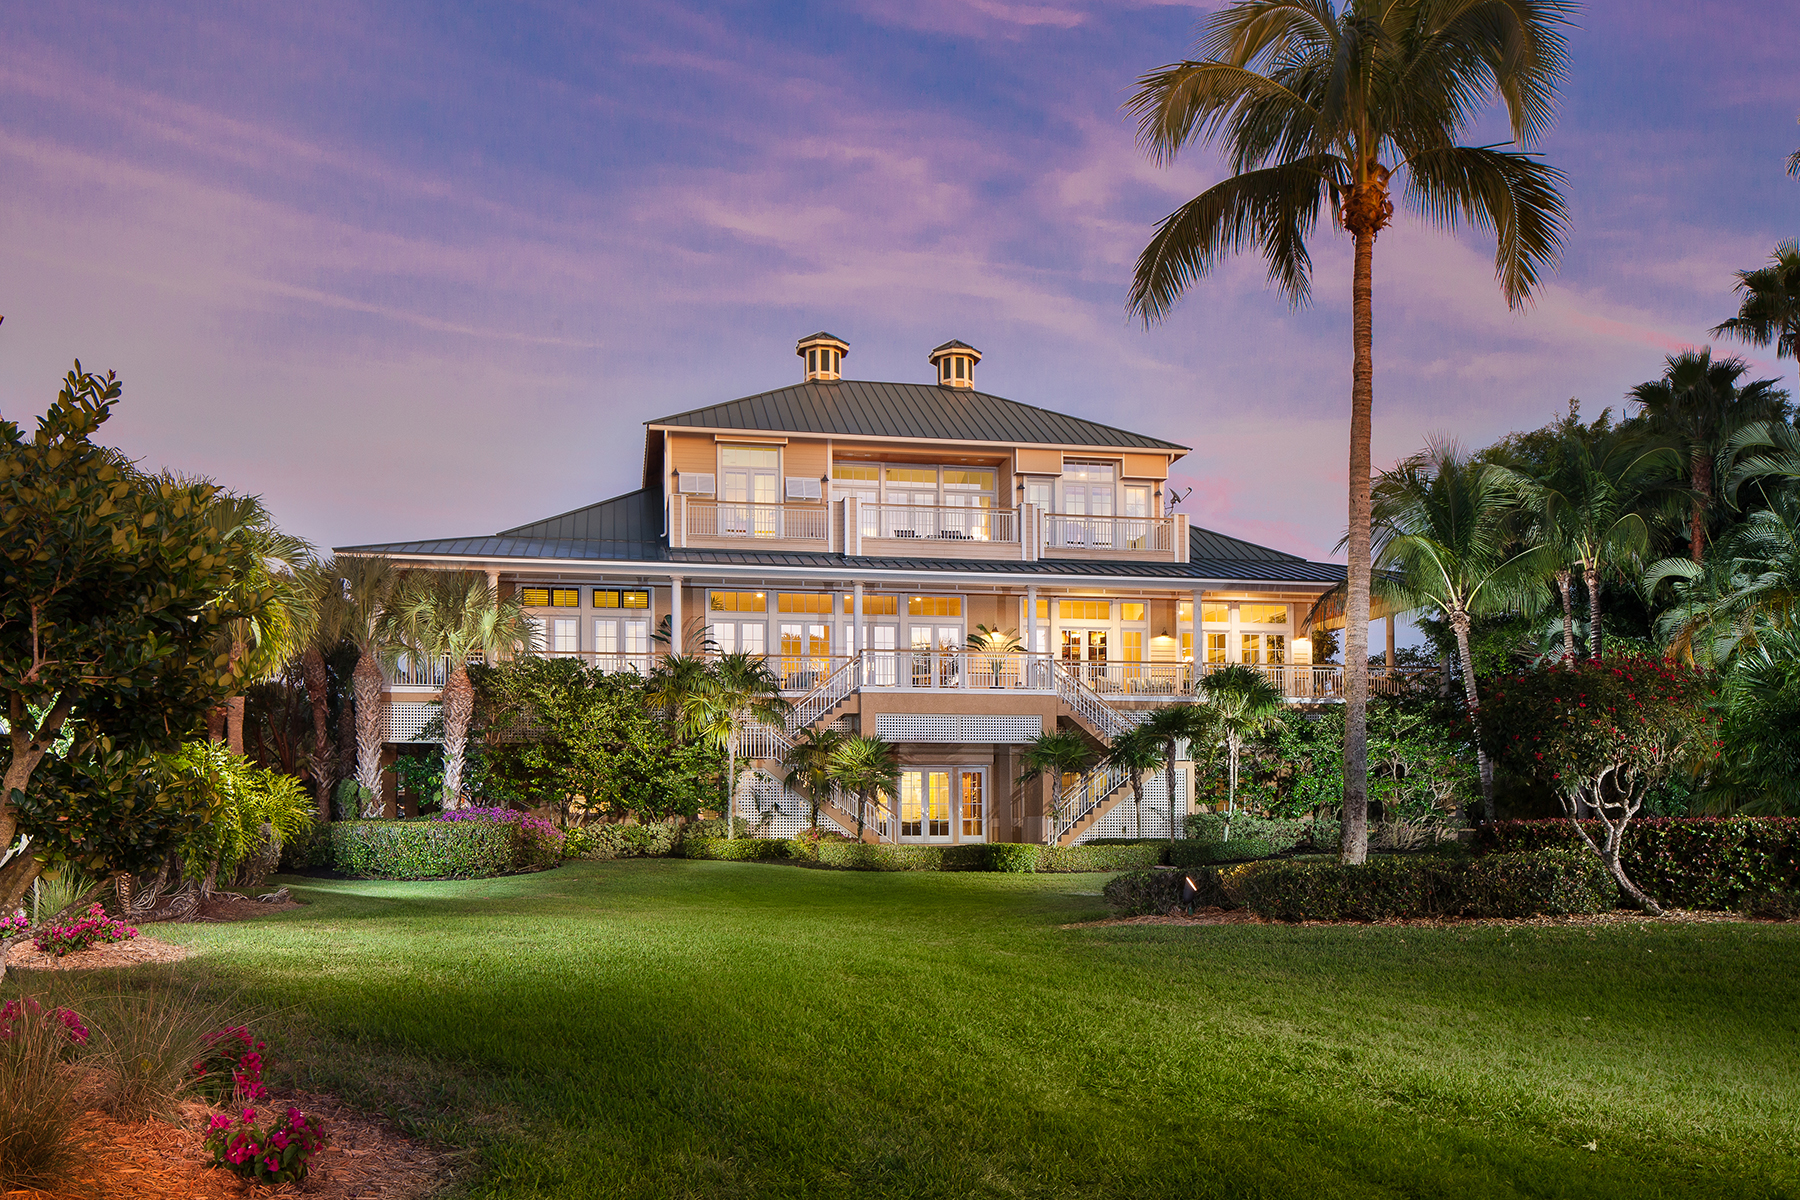 sales property at 201 Barefoot Beach Blvd , Bonita Springs, FL 34134